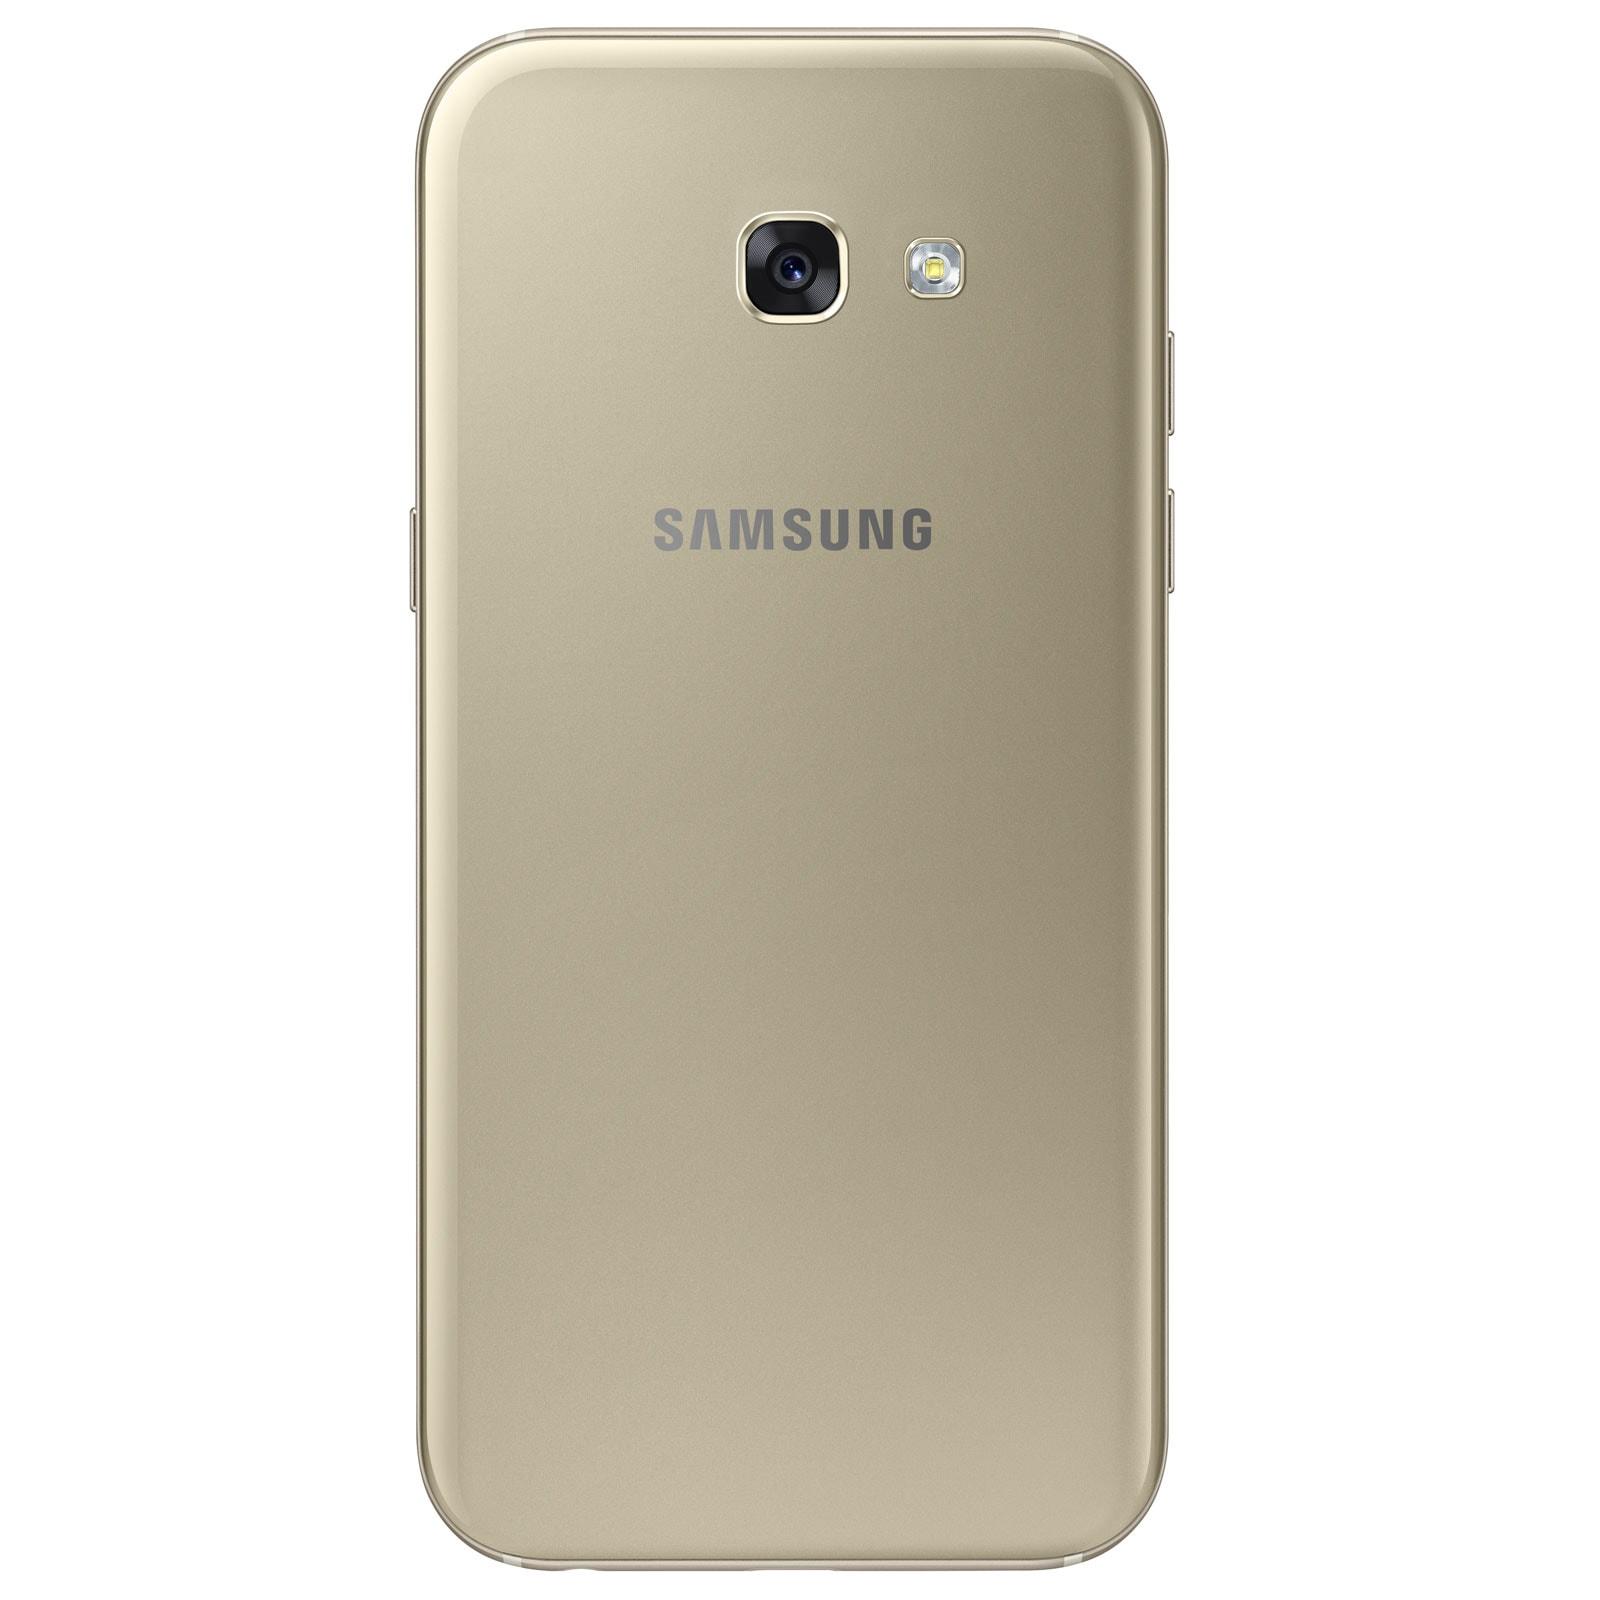 Samsung Galaxy A5 (2017) Or - Téléphonie Samsung - Cybertek.fr - 1